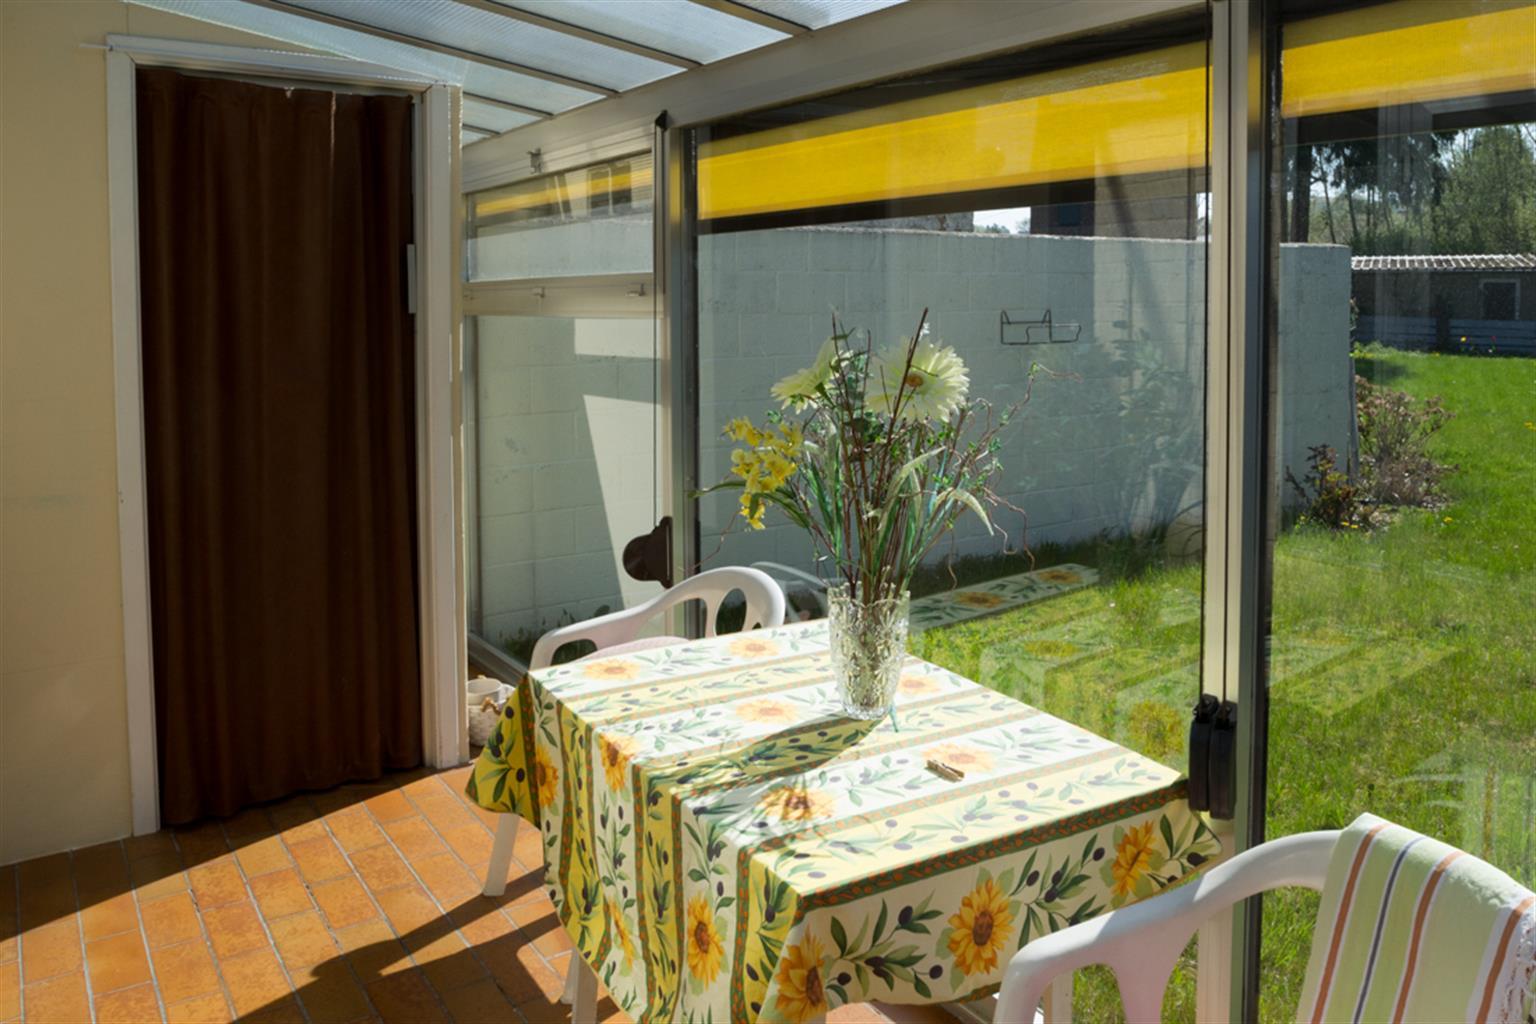 Maison - Leval-Trahegnies - #4345091-7